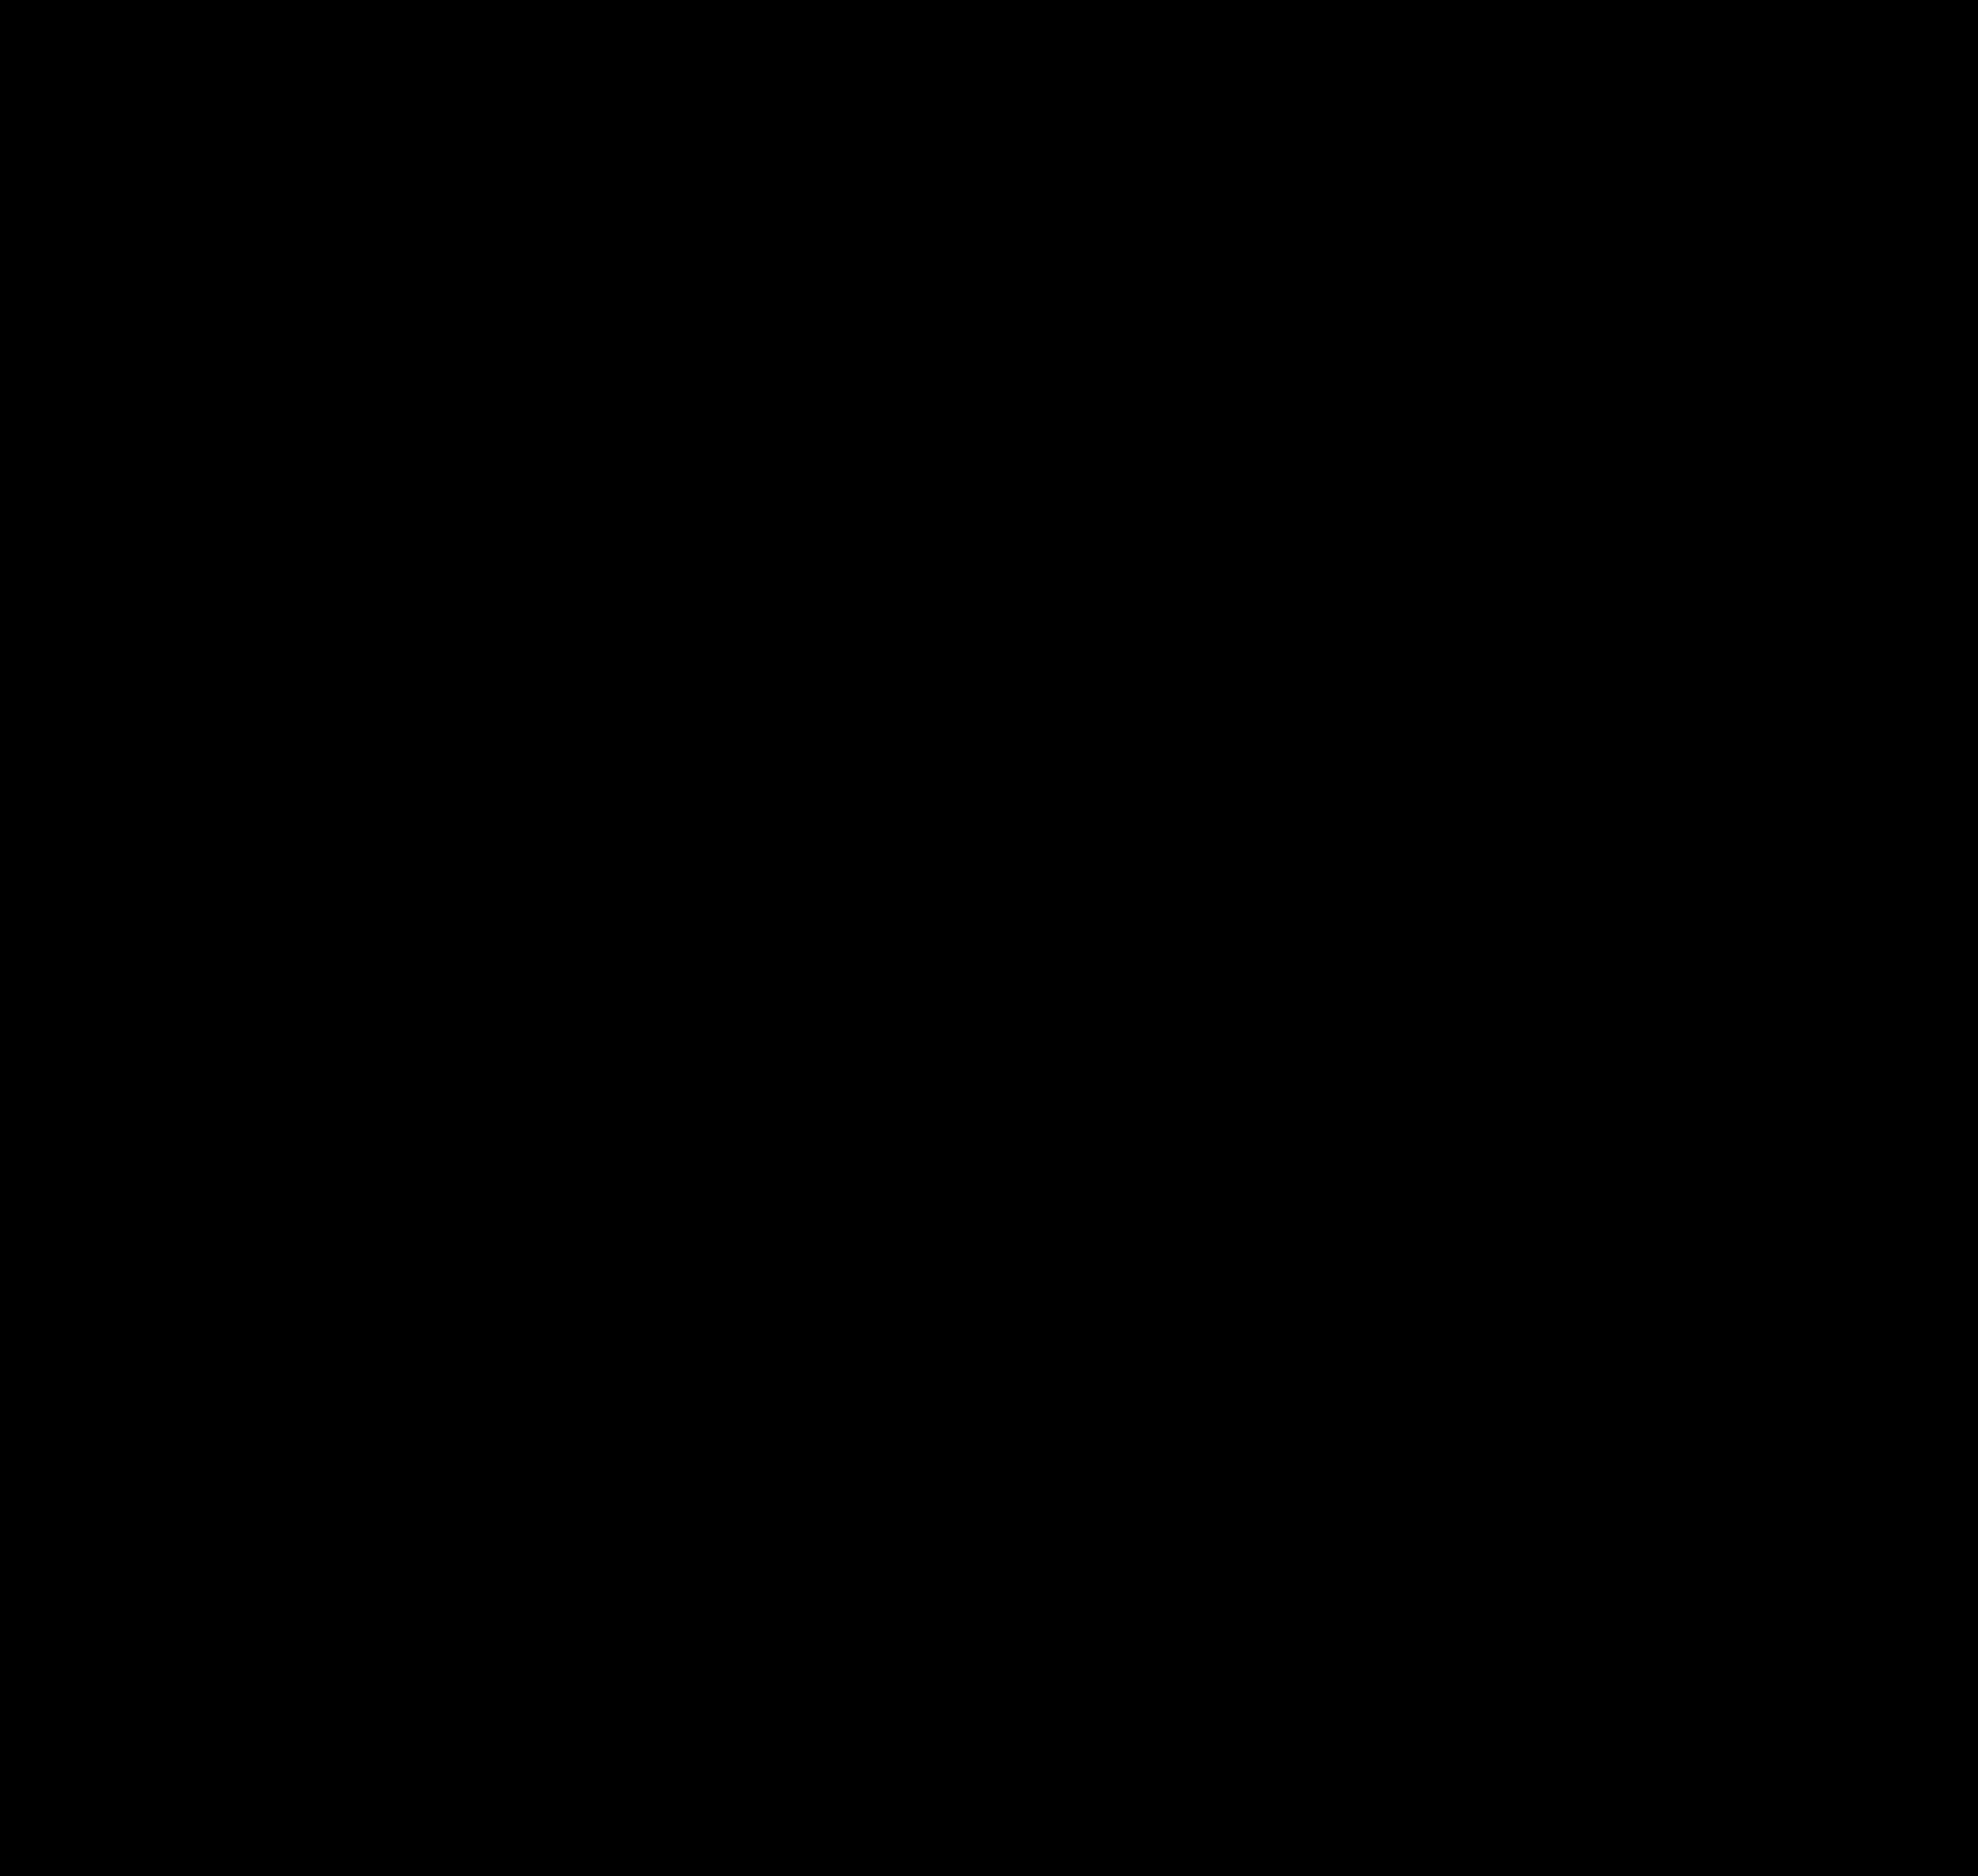 2400x2276 Silhouette Head Group